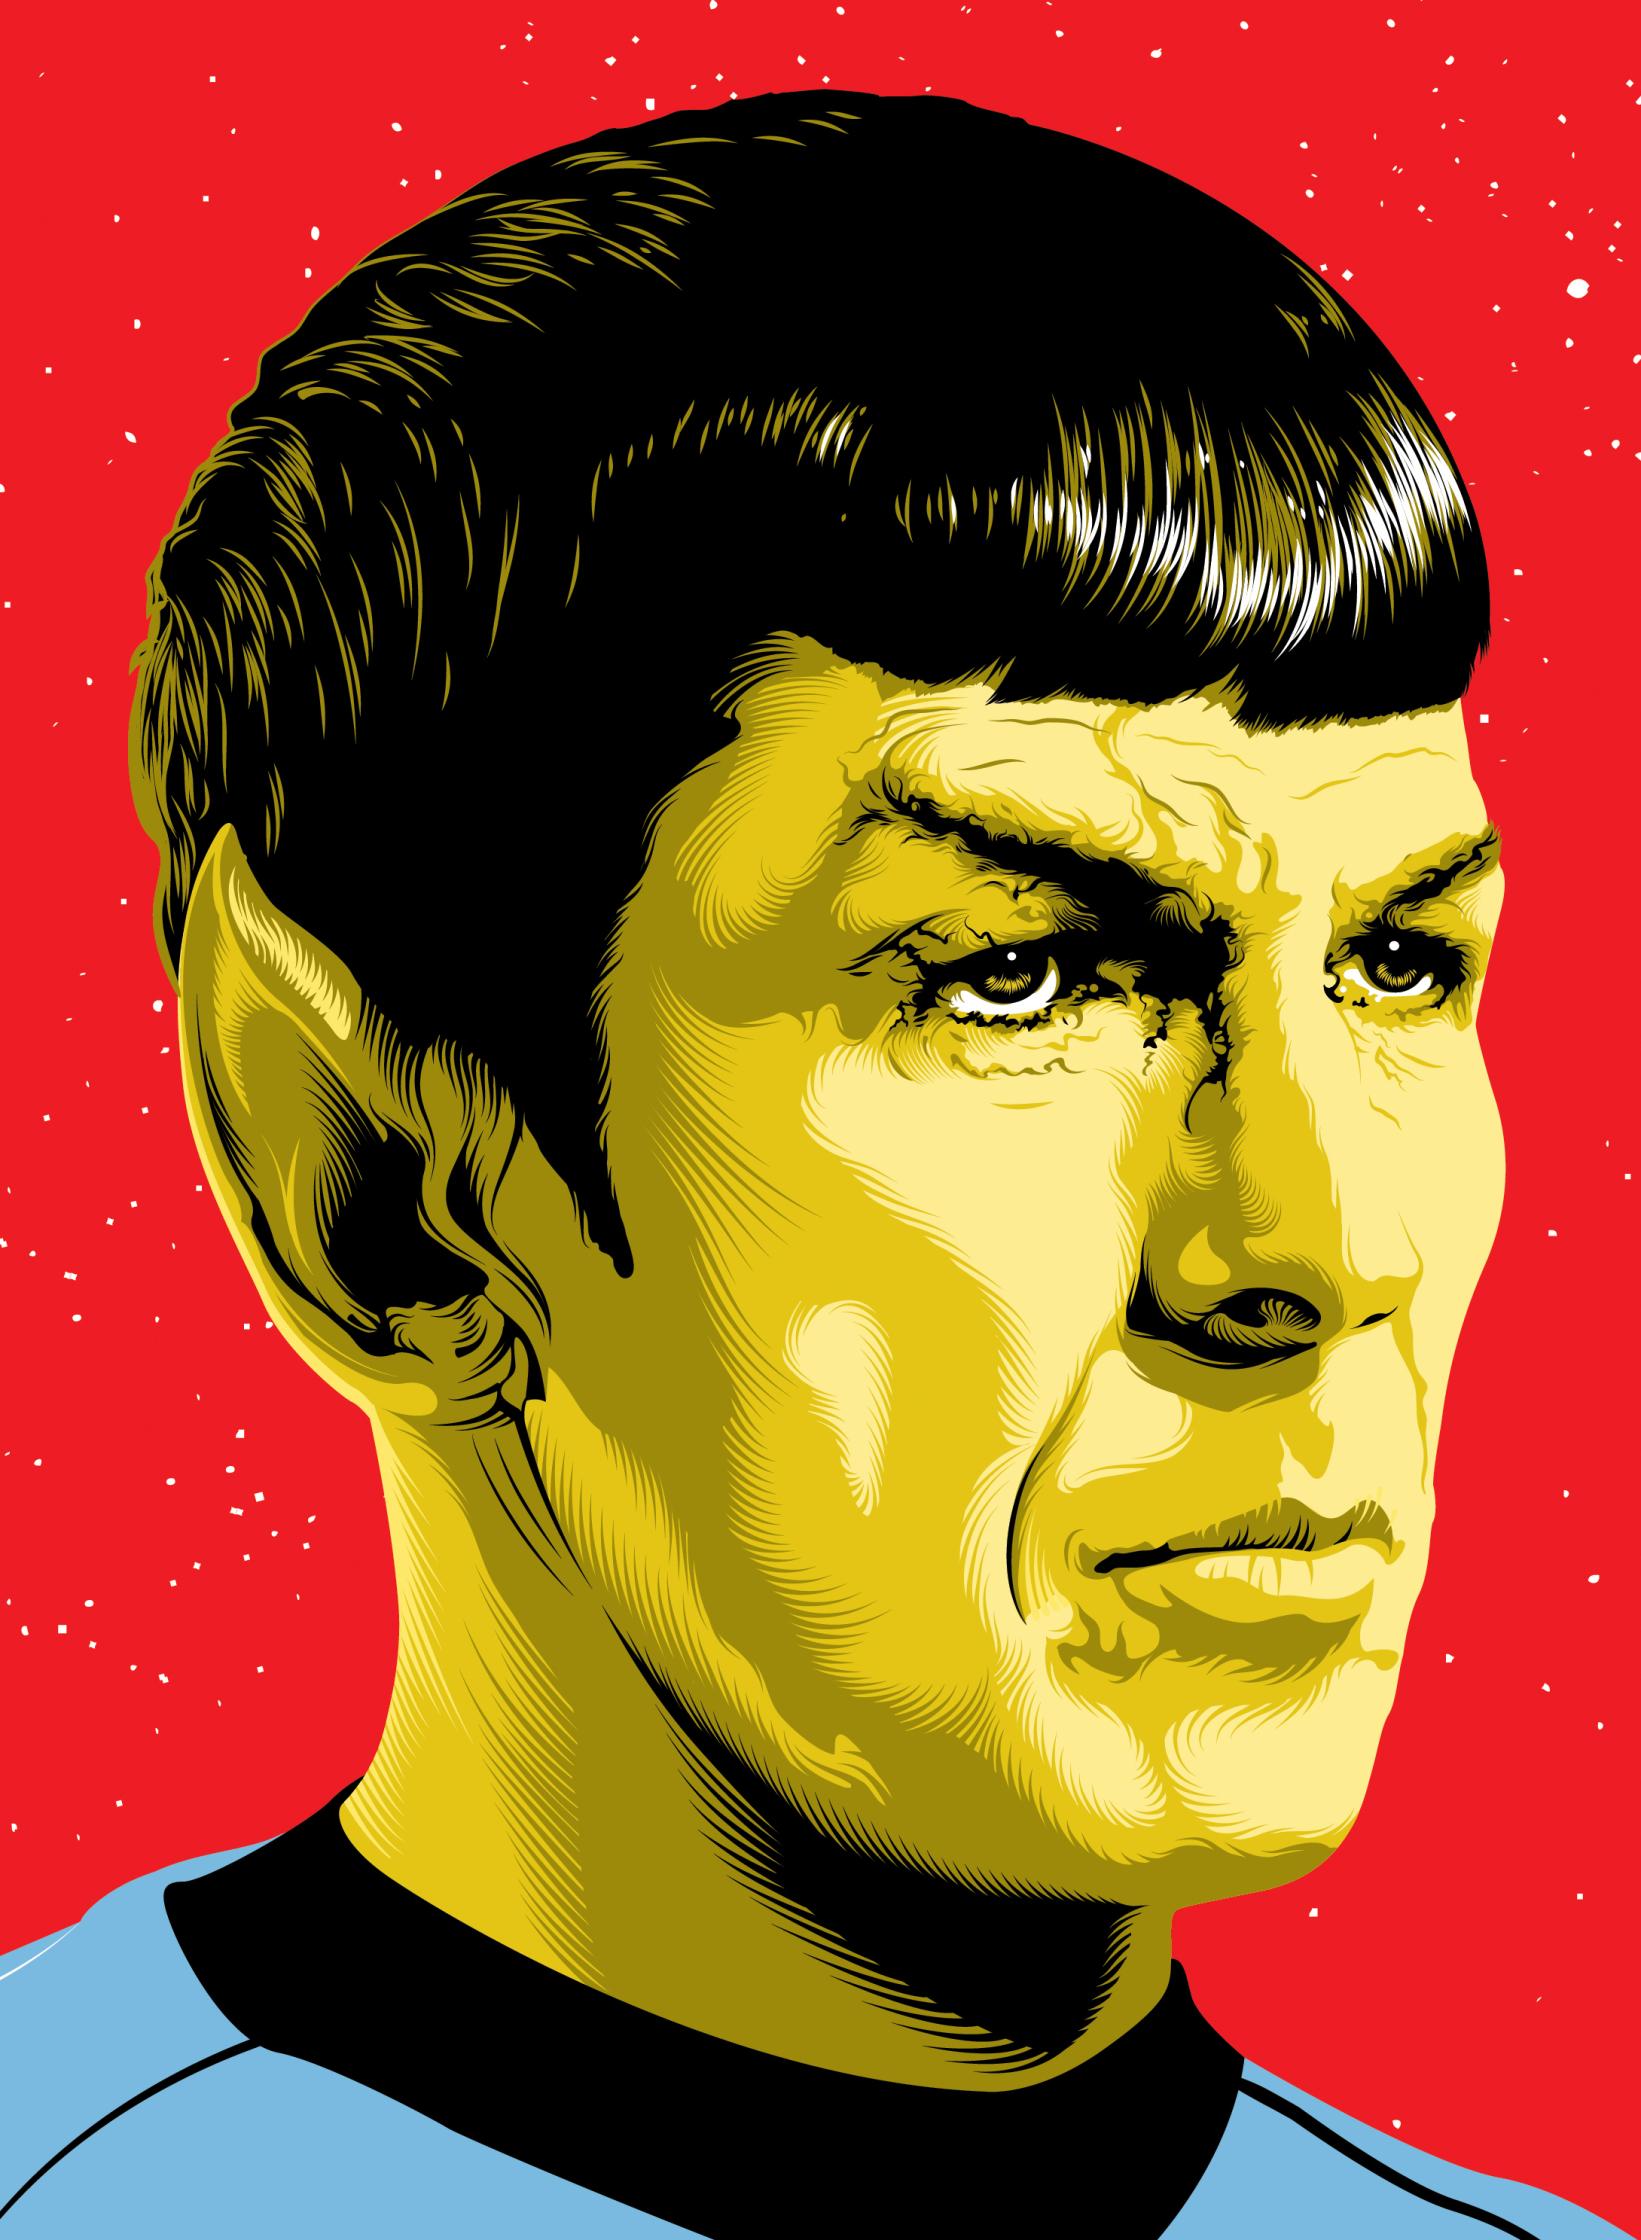 Live Long Spock